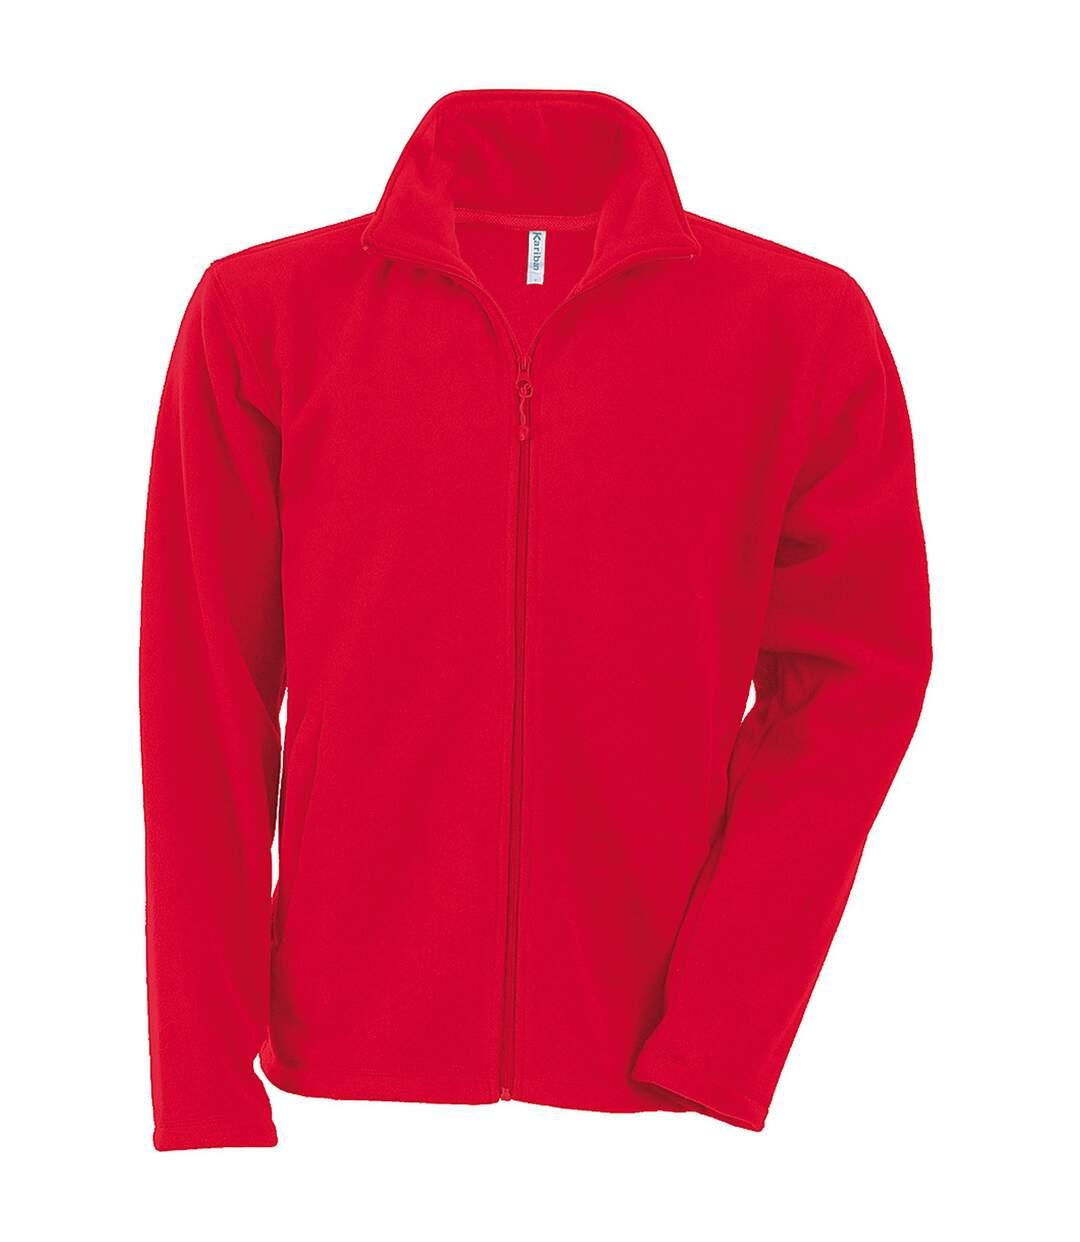 Kariban Mens Falco Full Zip Anti Pill Fleece Jacket (Red) - UTRW737